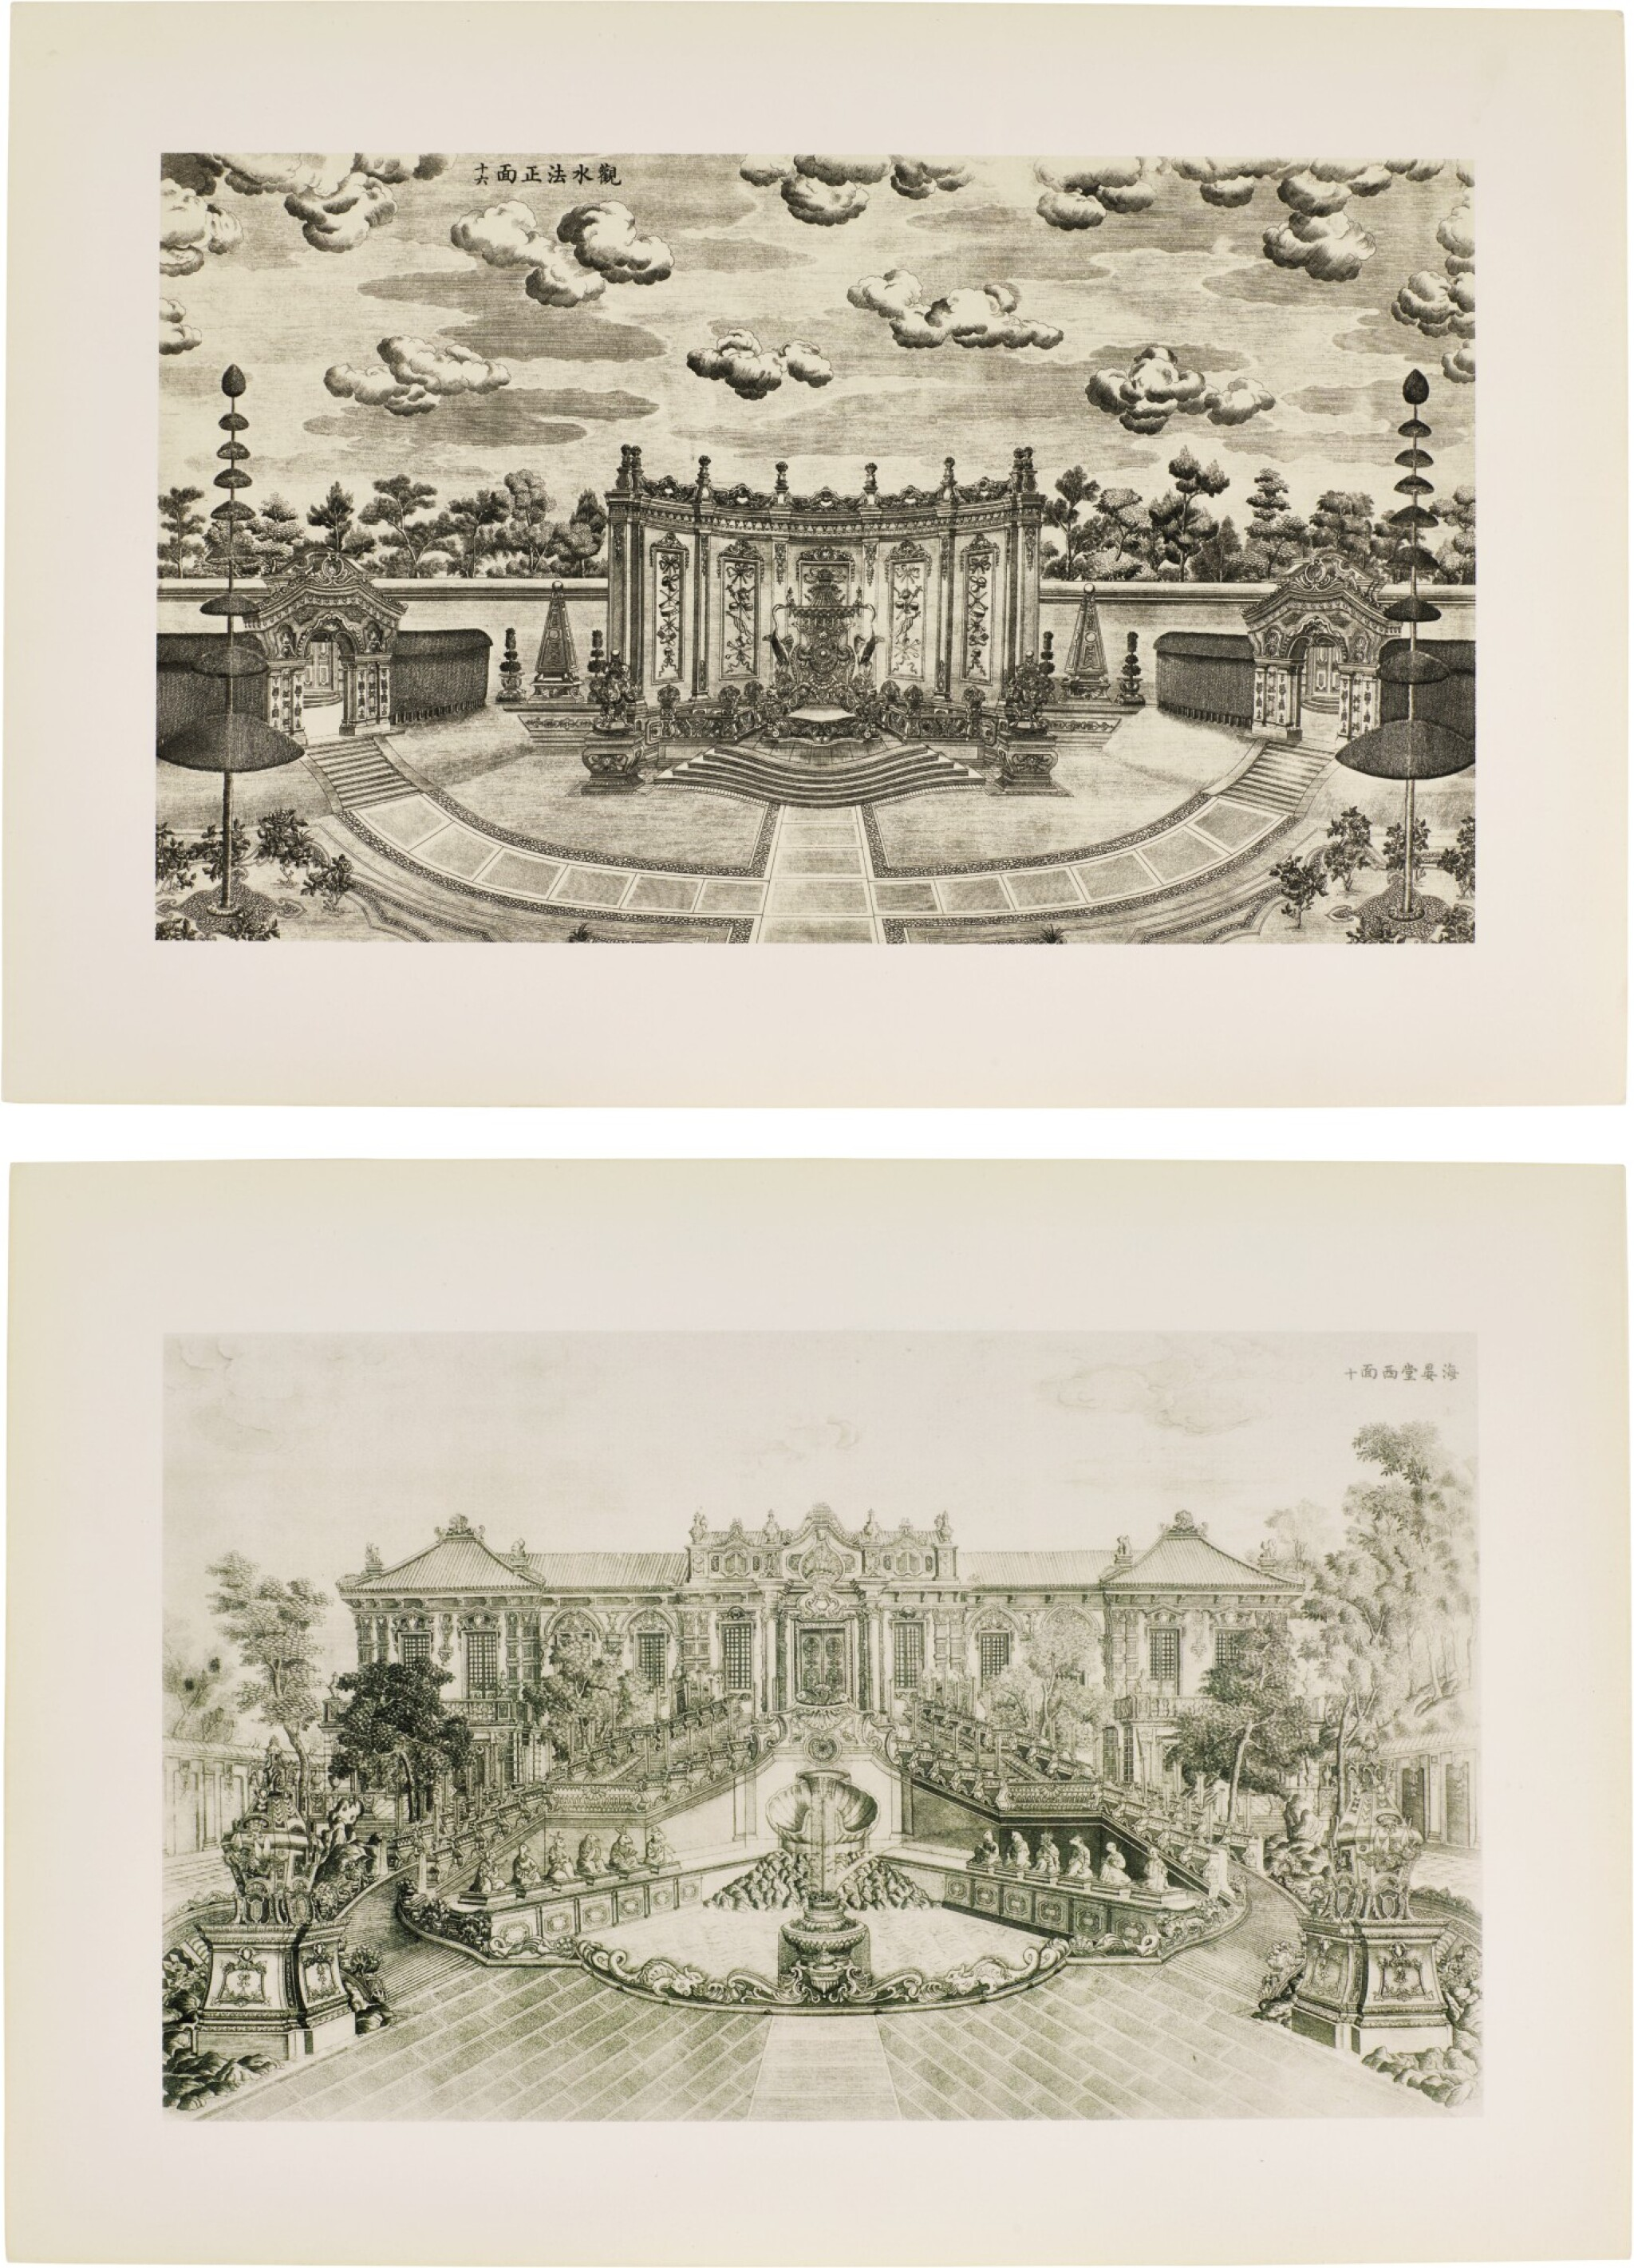 View full screen - View 1 of Lot 362. A SET OF TWENTY PRINTS OF PALACES, PAVILIONS AND GARDENS AT YUANMING YUAN | 巴黎、1977年 《郎世寧圓明園西洋樓》 一組二十幅 水墨紙本.